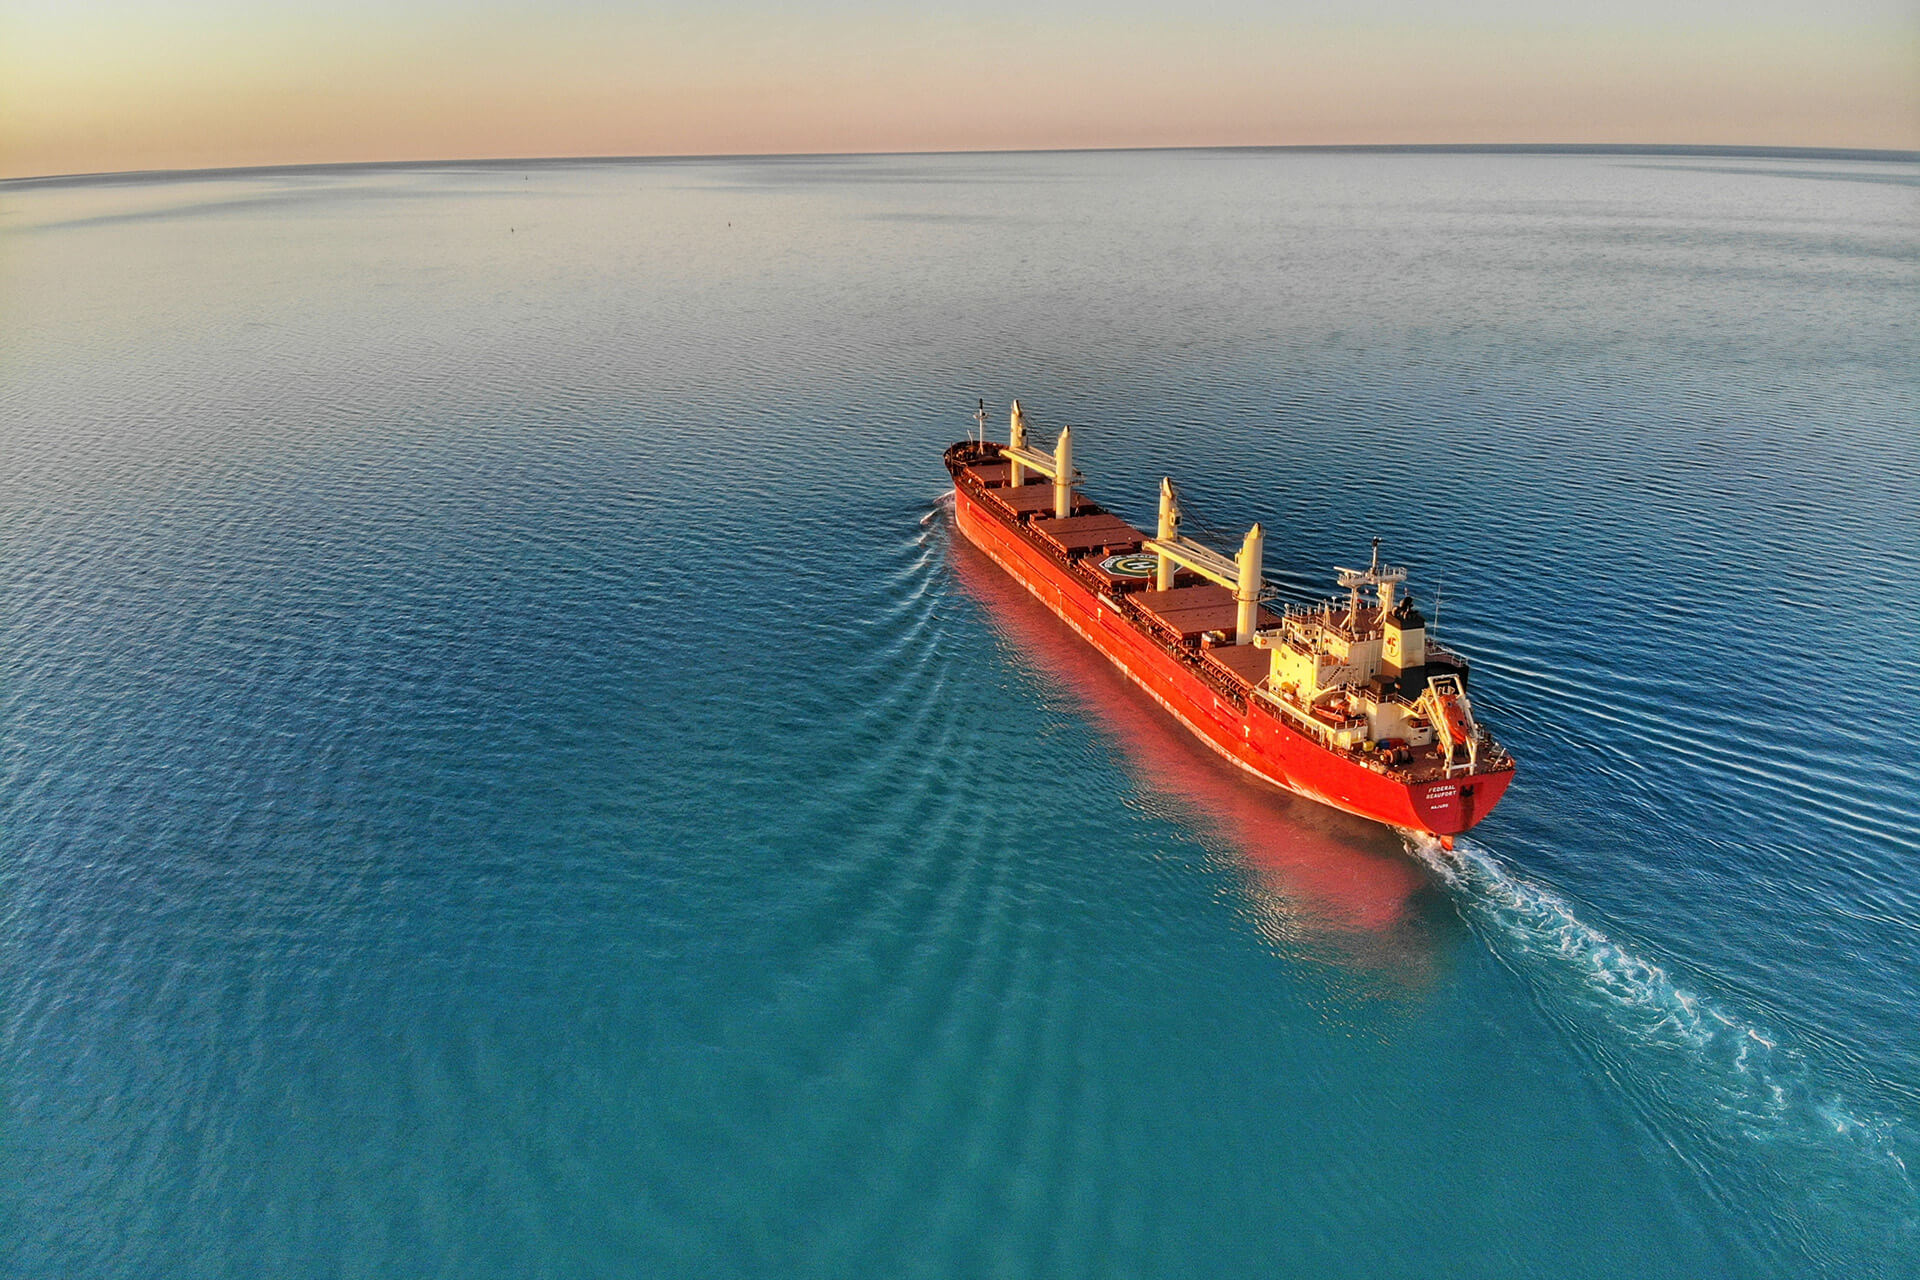 Maritime Hearing Loss Lawyers